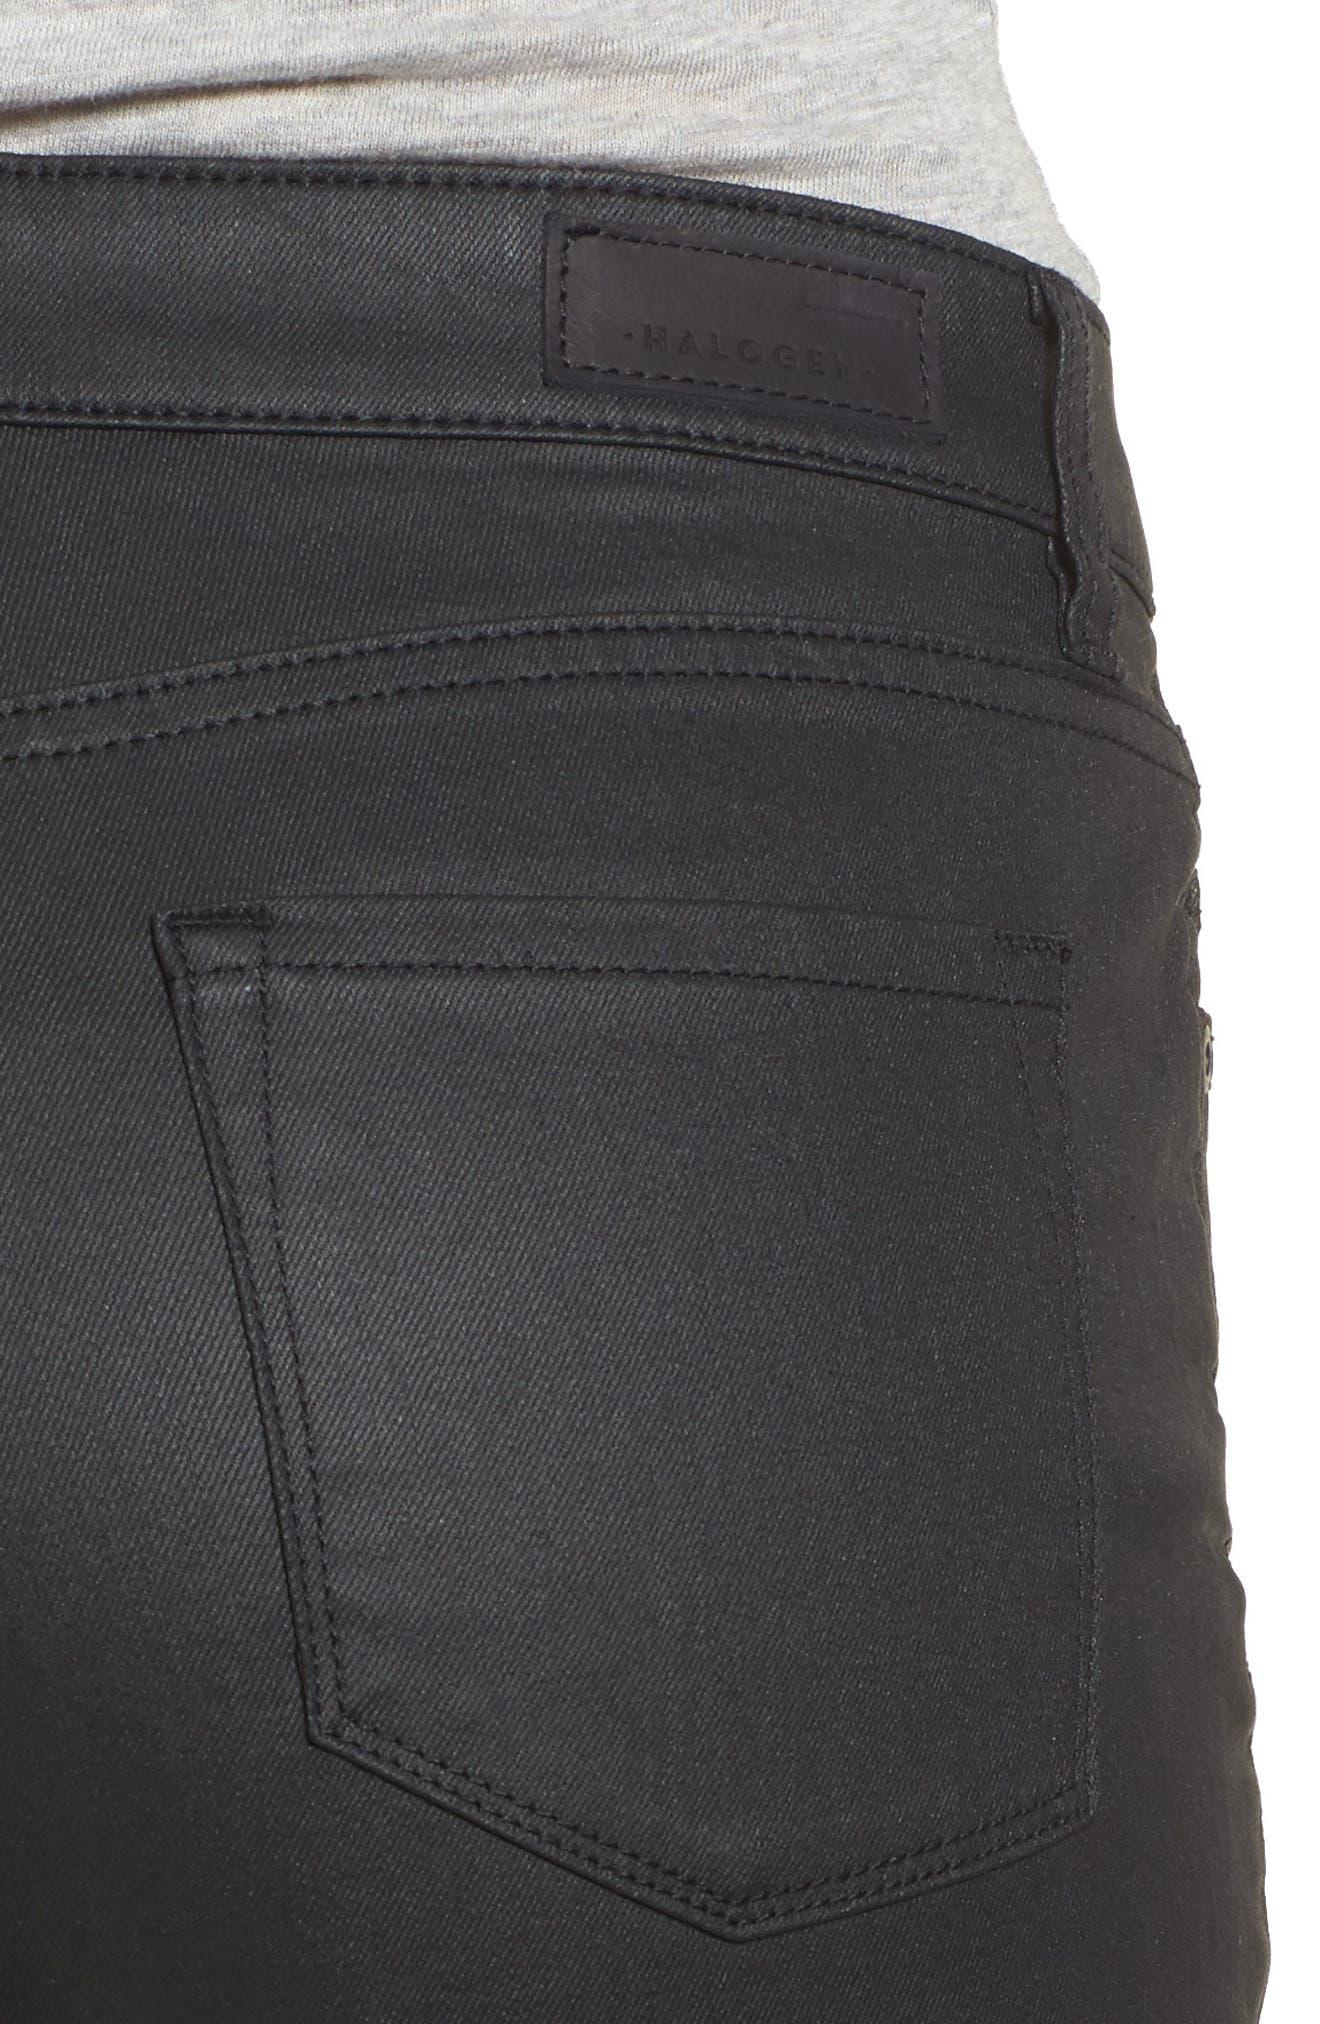 Alternate Image 4  - Halogen® Coated Skinny Jeans (Regular & Petite)